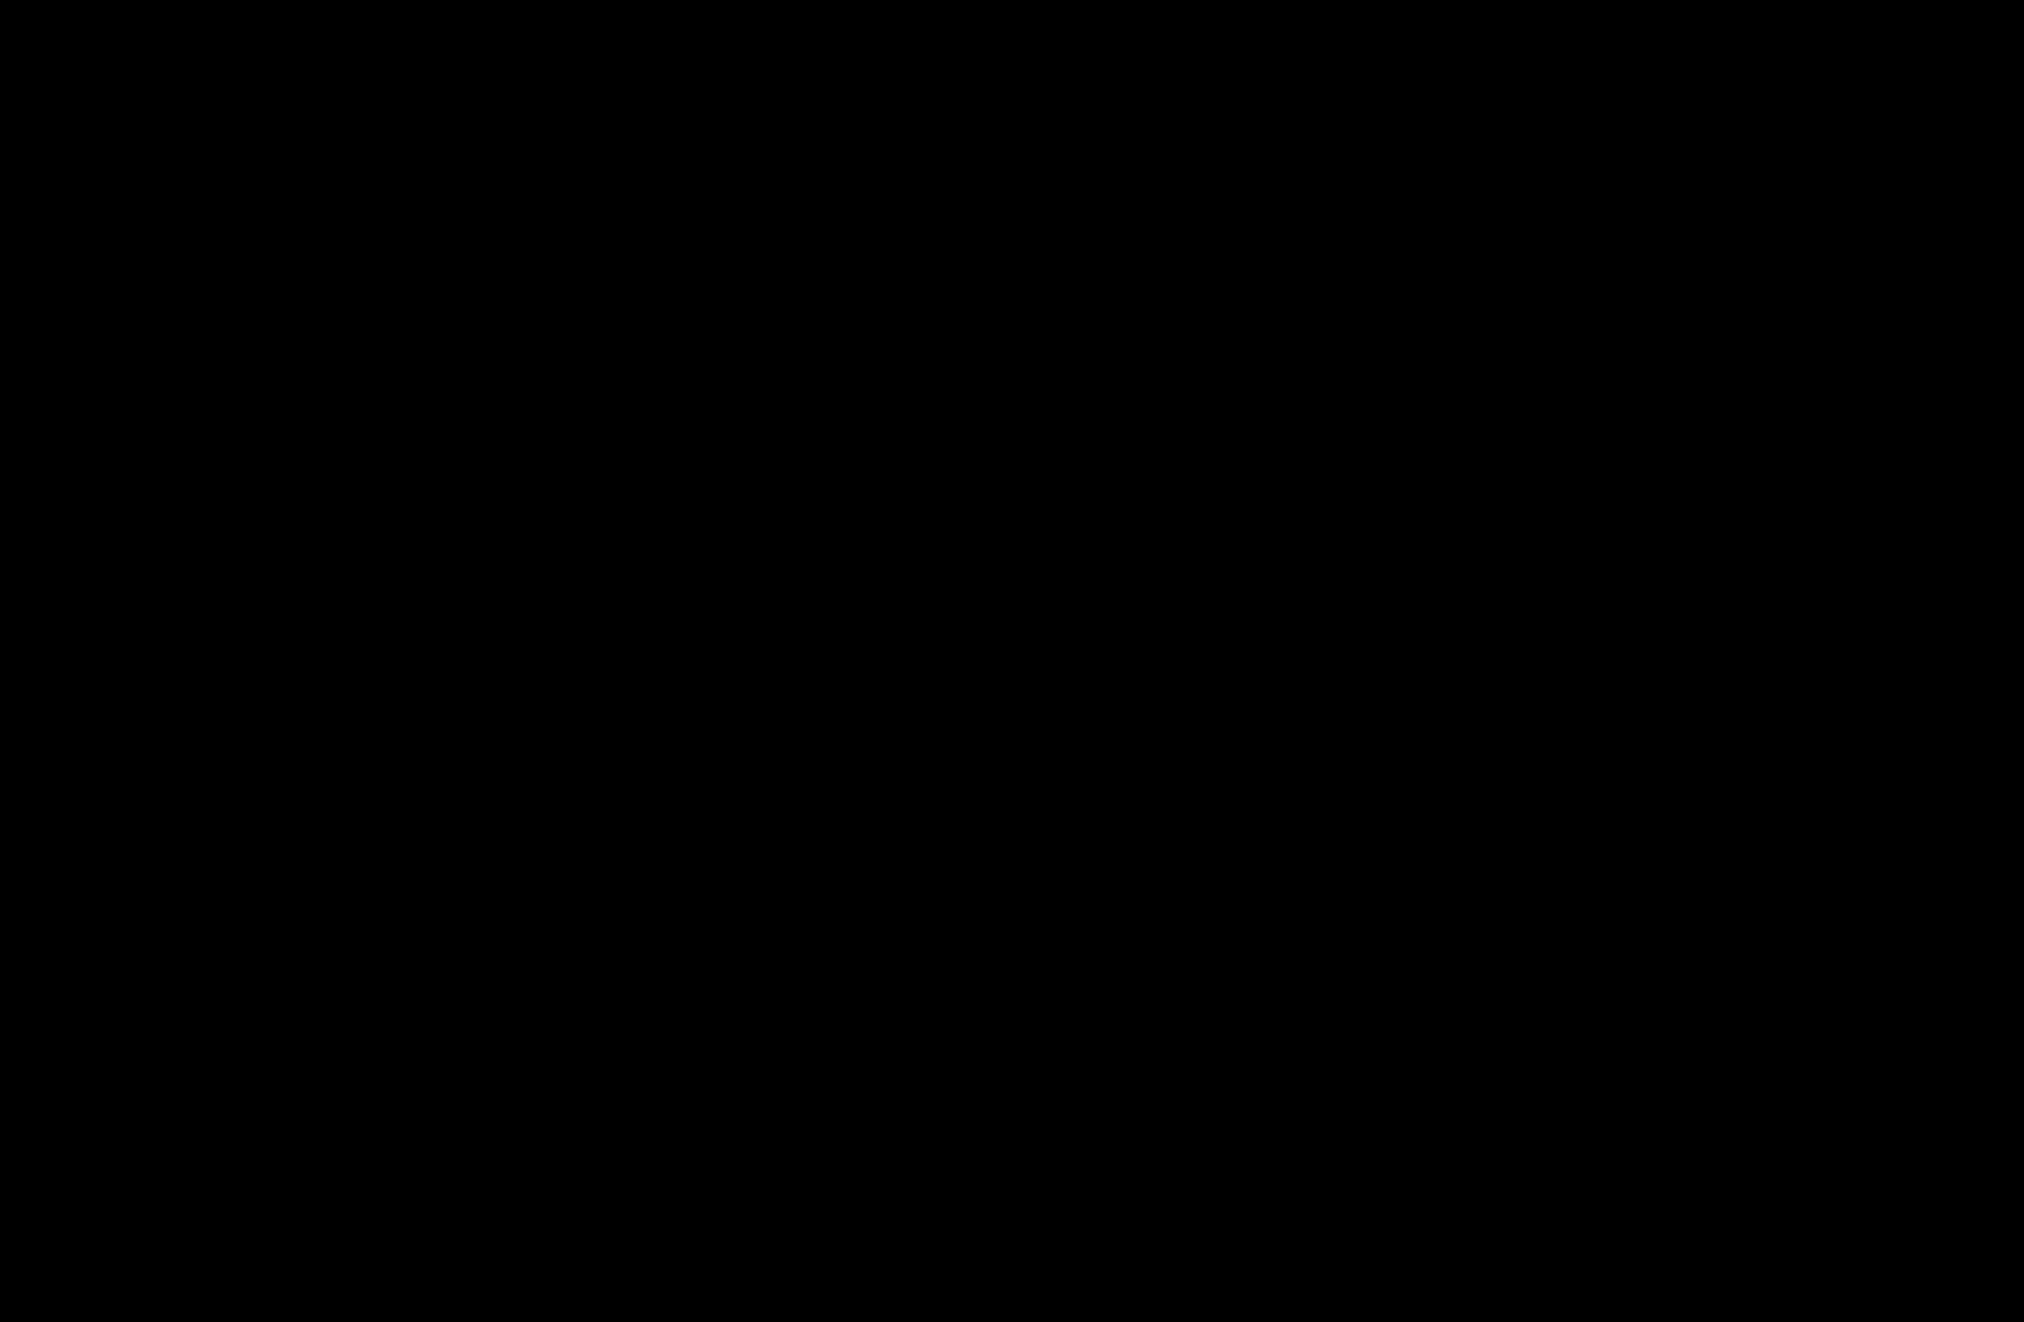 GBR 13069 dihydrochloride